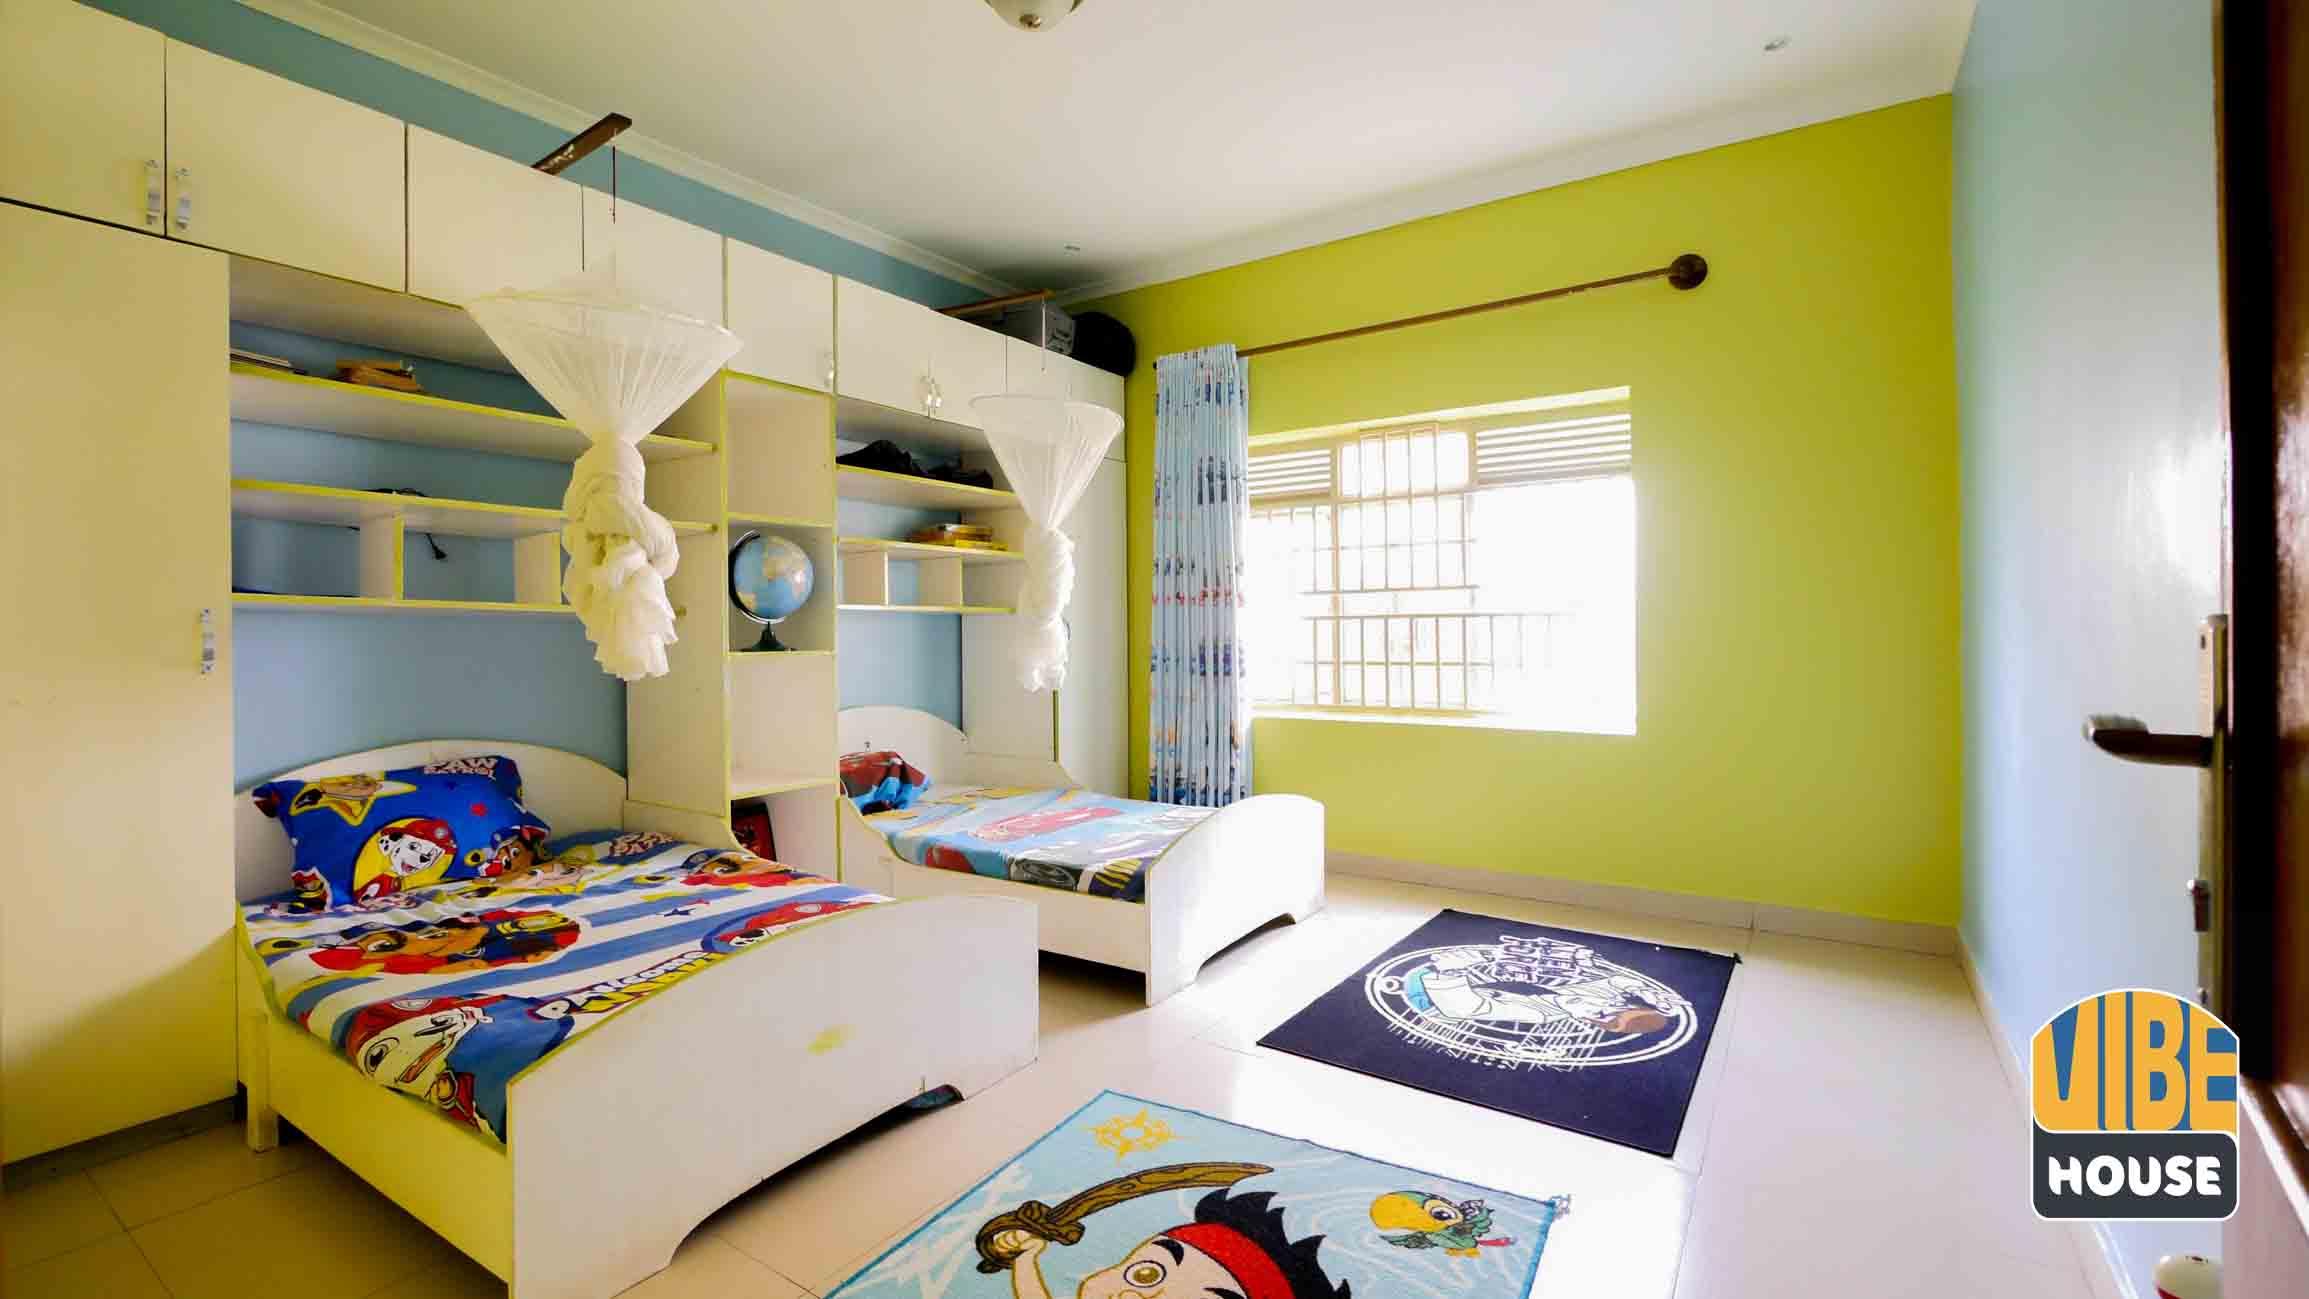 Furnished house for rent with fun kids furniture in Kibagabaga, Kigali